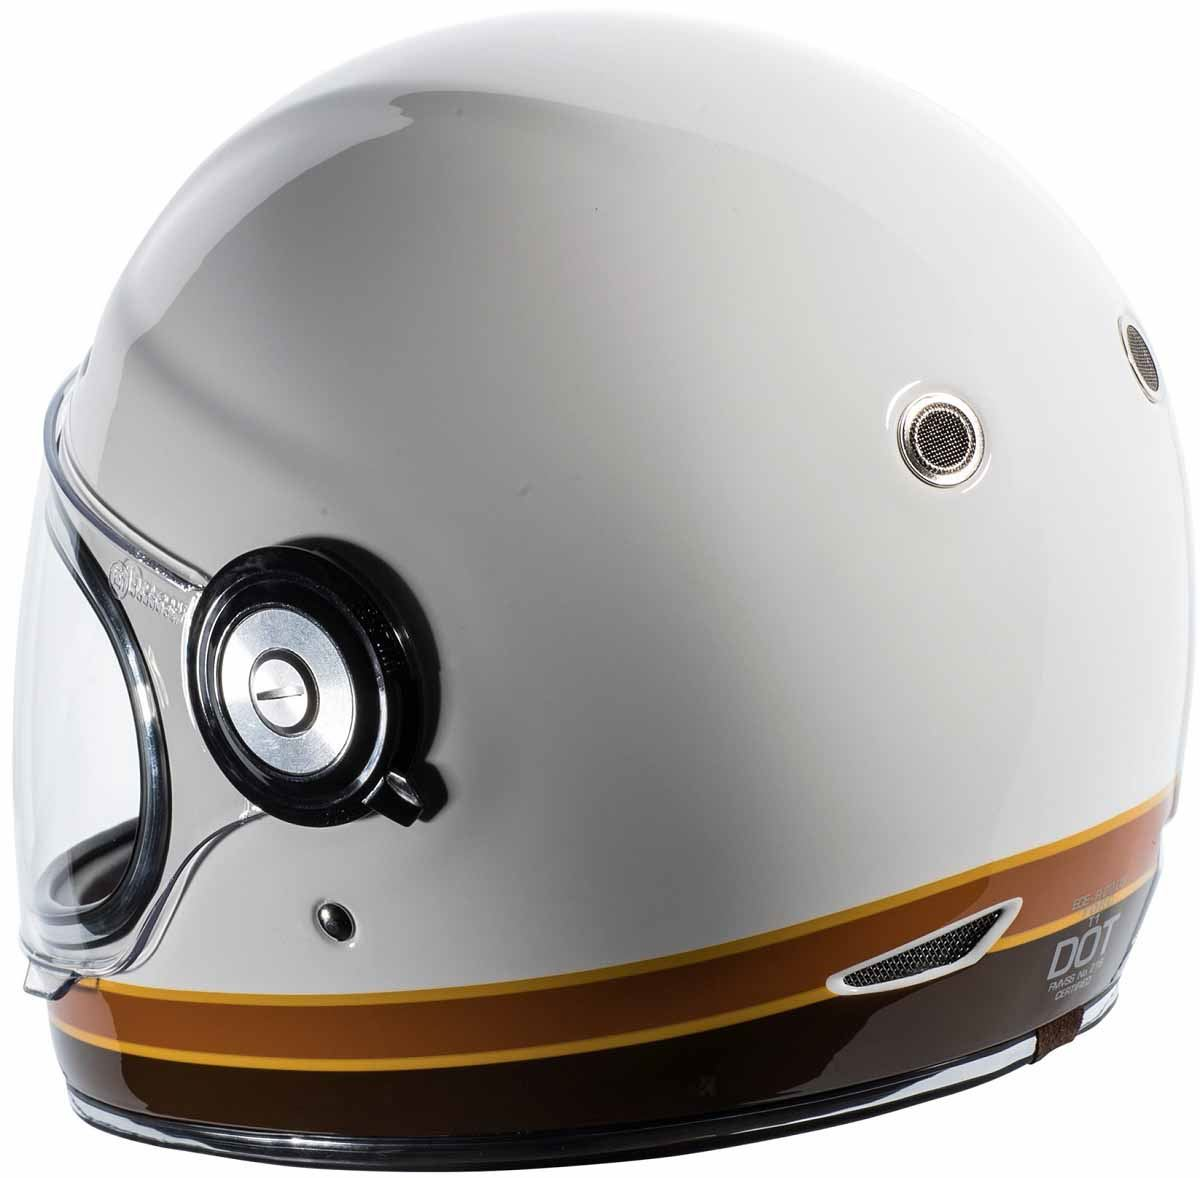 miniature 26 - Torc T1 Helmet Retro Vintage Style Fiberglass DOT Approved XS-2XL